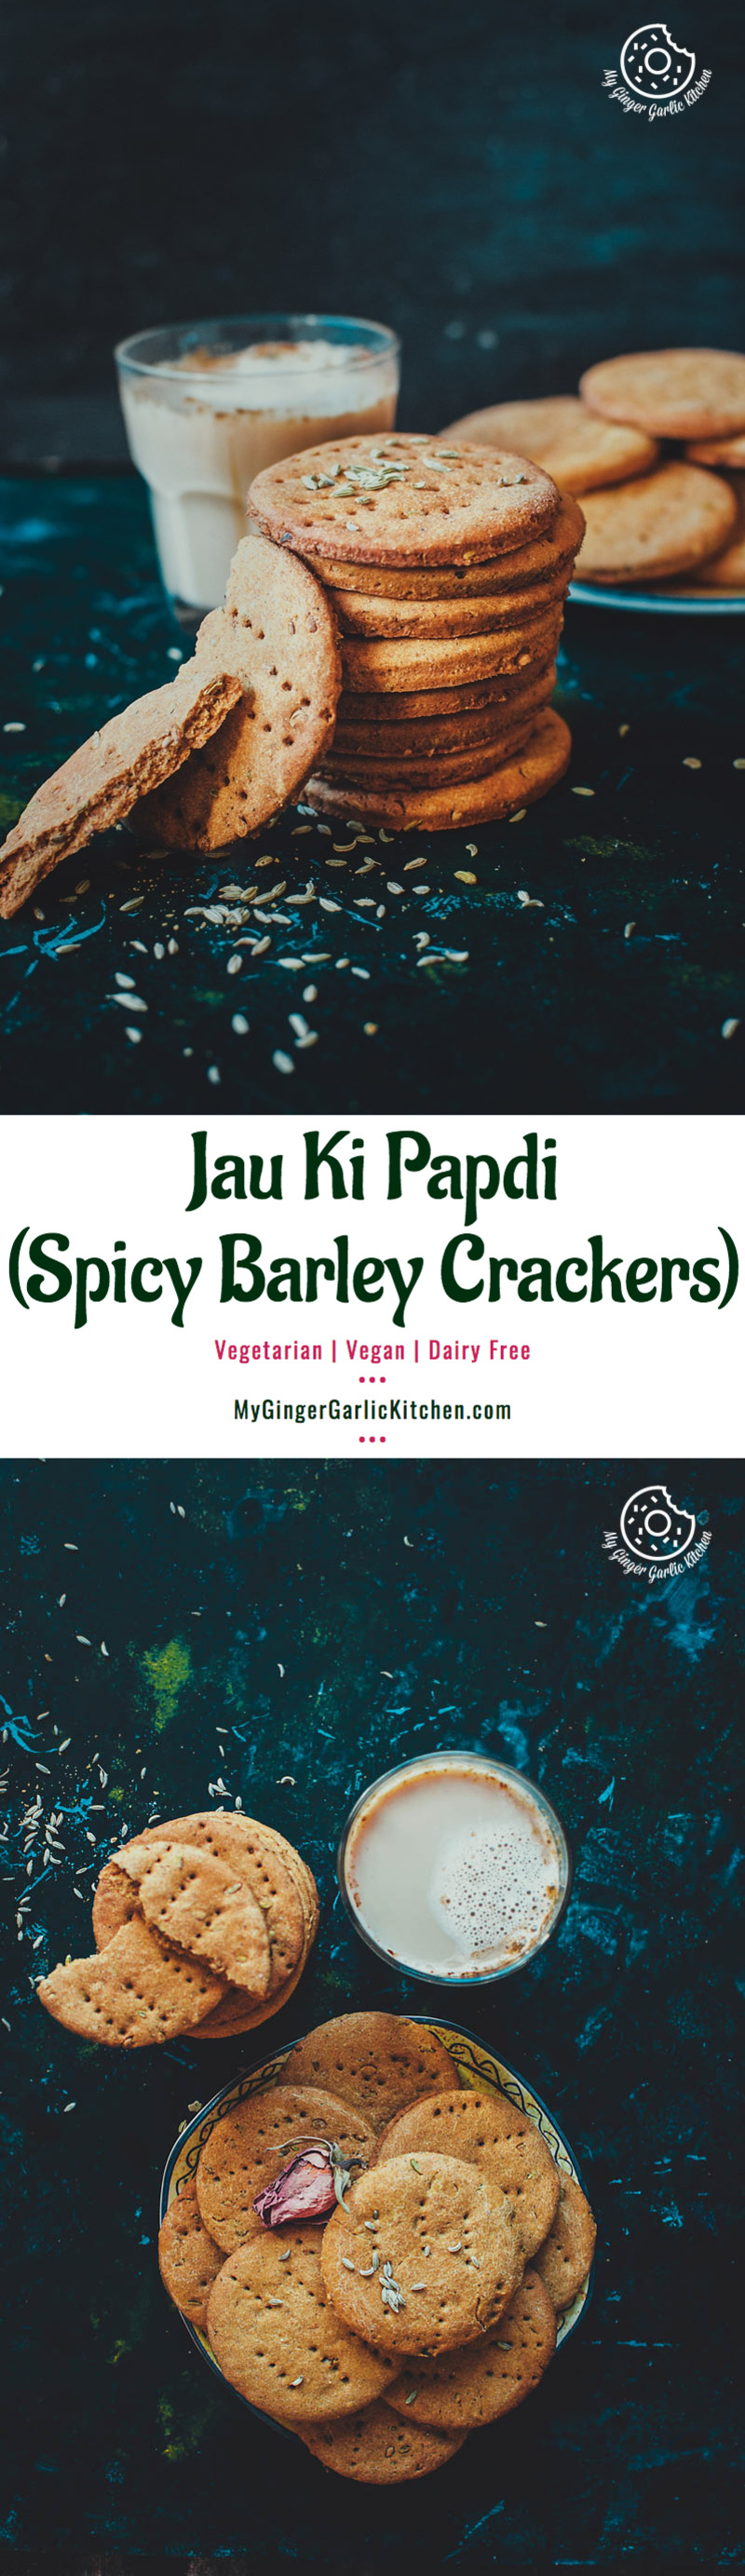 Masaledar Jau Ki Papdi   Spicy Barley Crackers   Black Chickpeas Chaat   mygingergarlickitchen.com/ @anupama_dreams